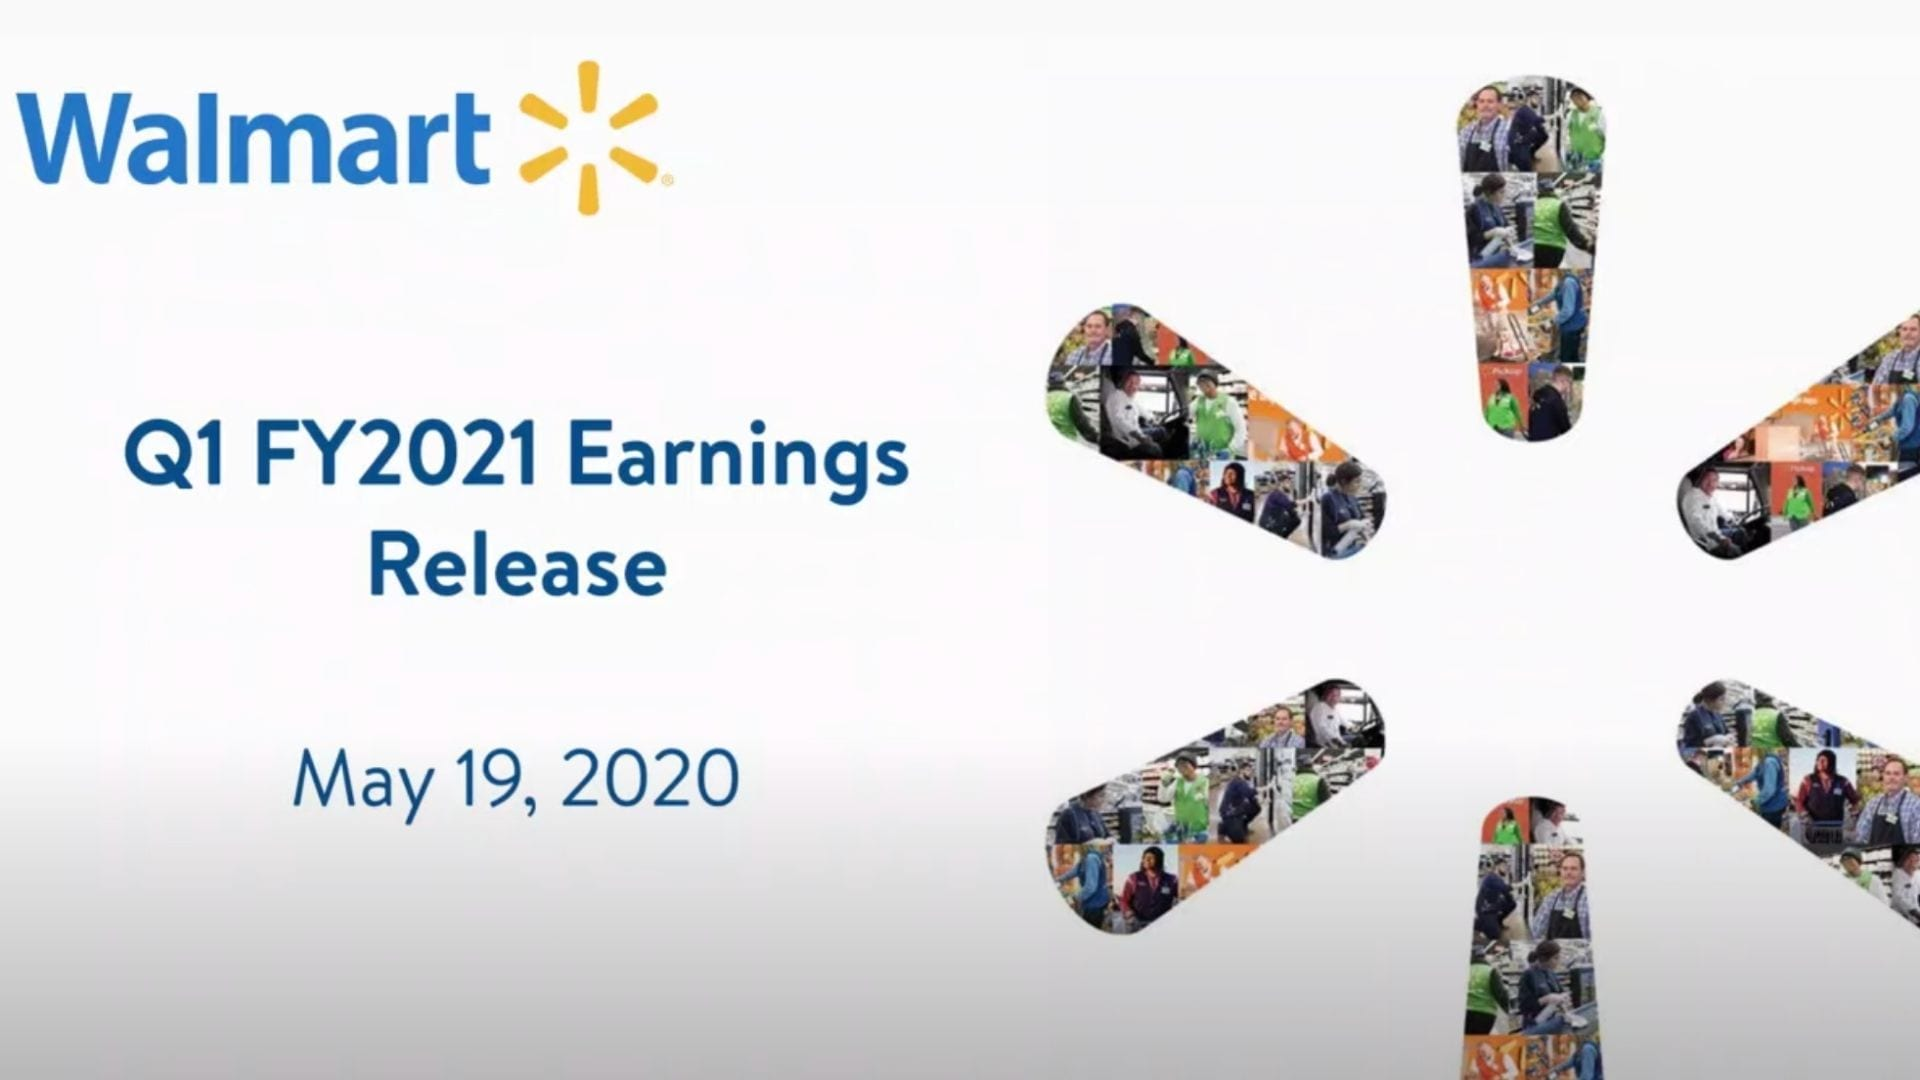 Walmart Earnings Call March 19